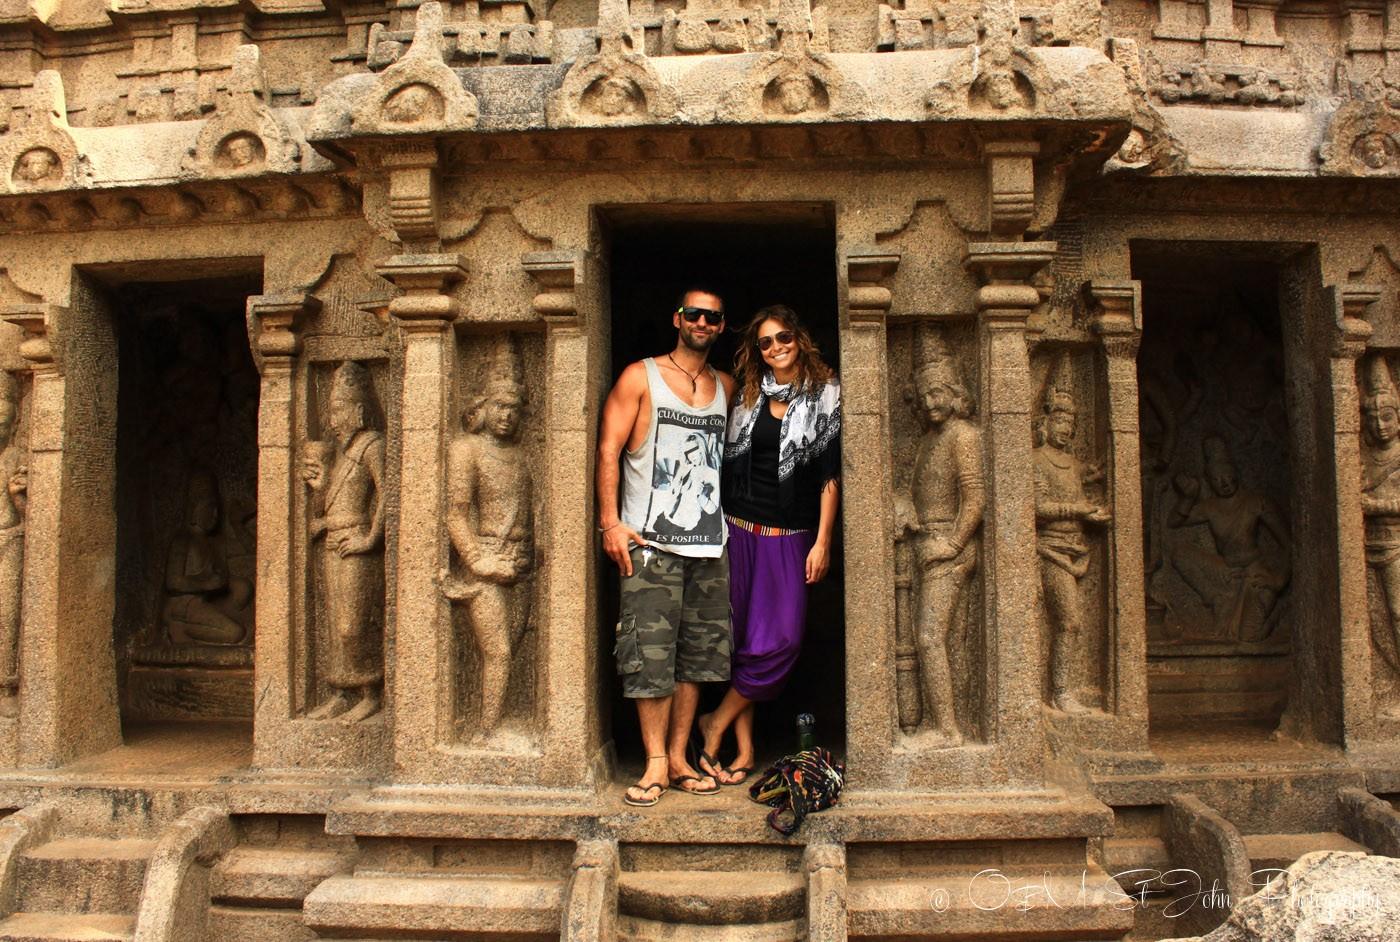 Max and Oksana at ruins in Mahabalipuram, India